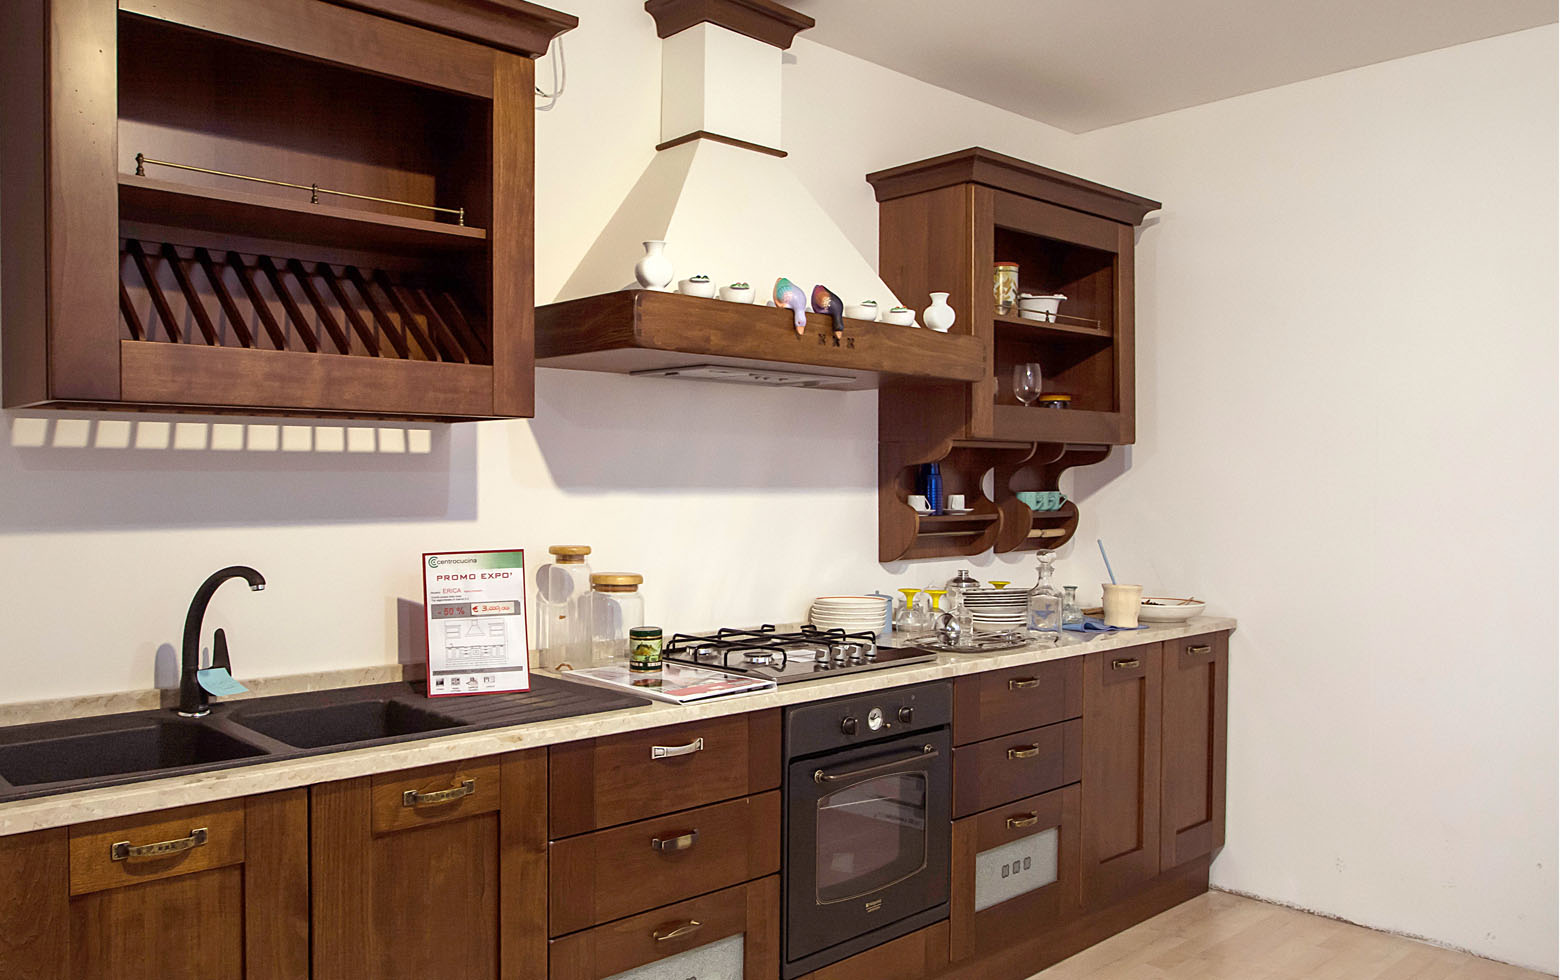 Cucine_Lube_Erika